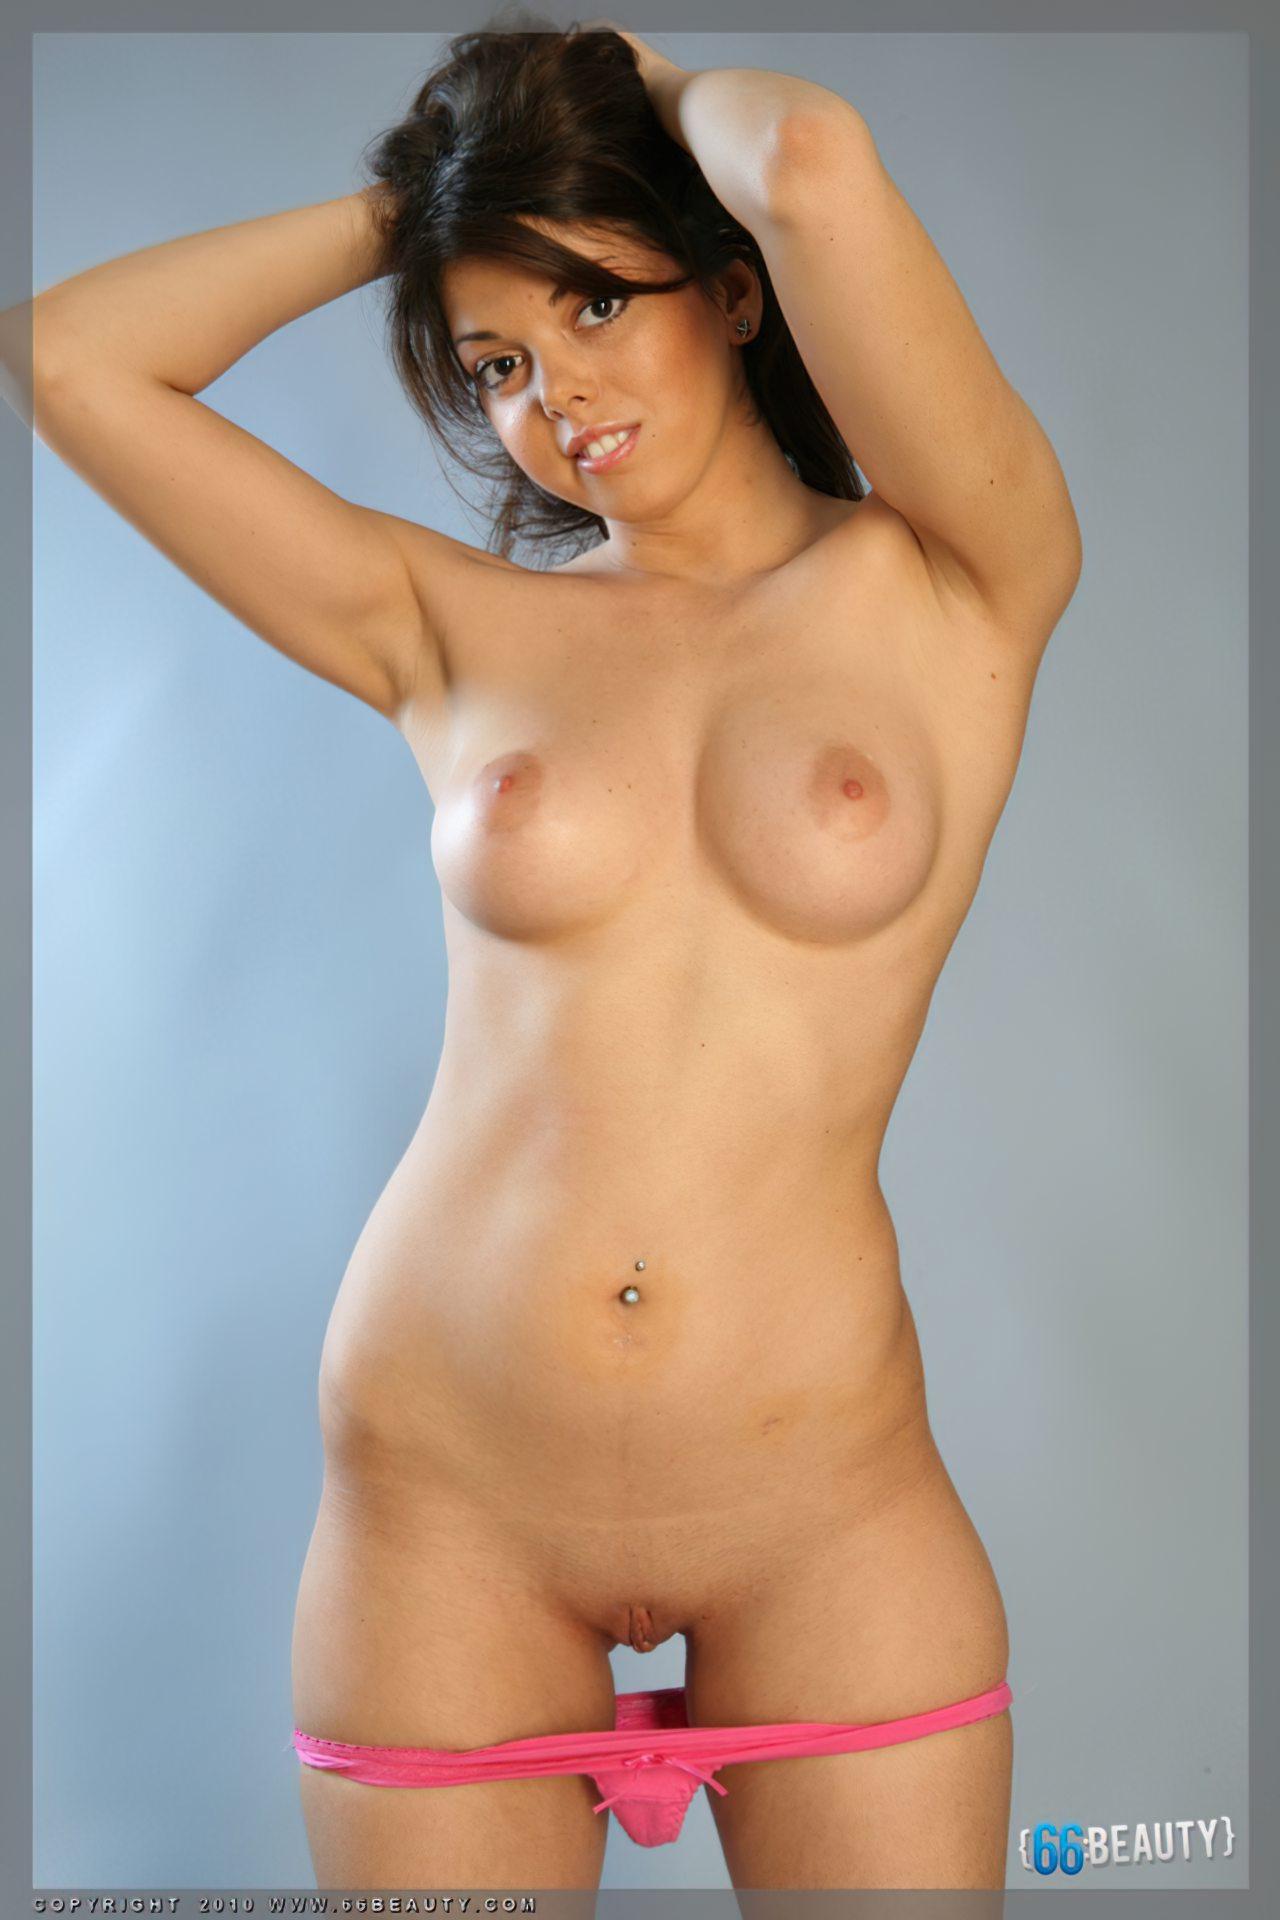 Fotos Mulher Nua (31)